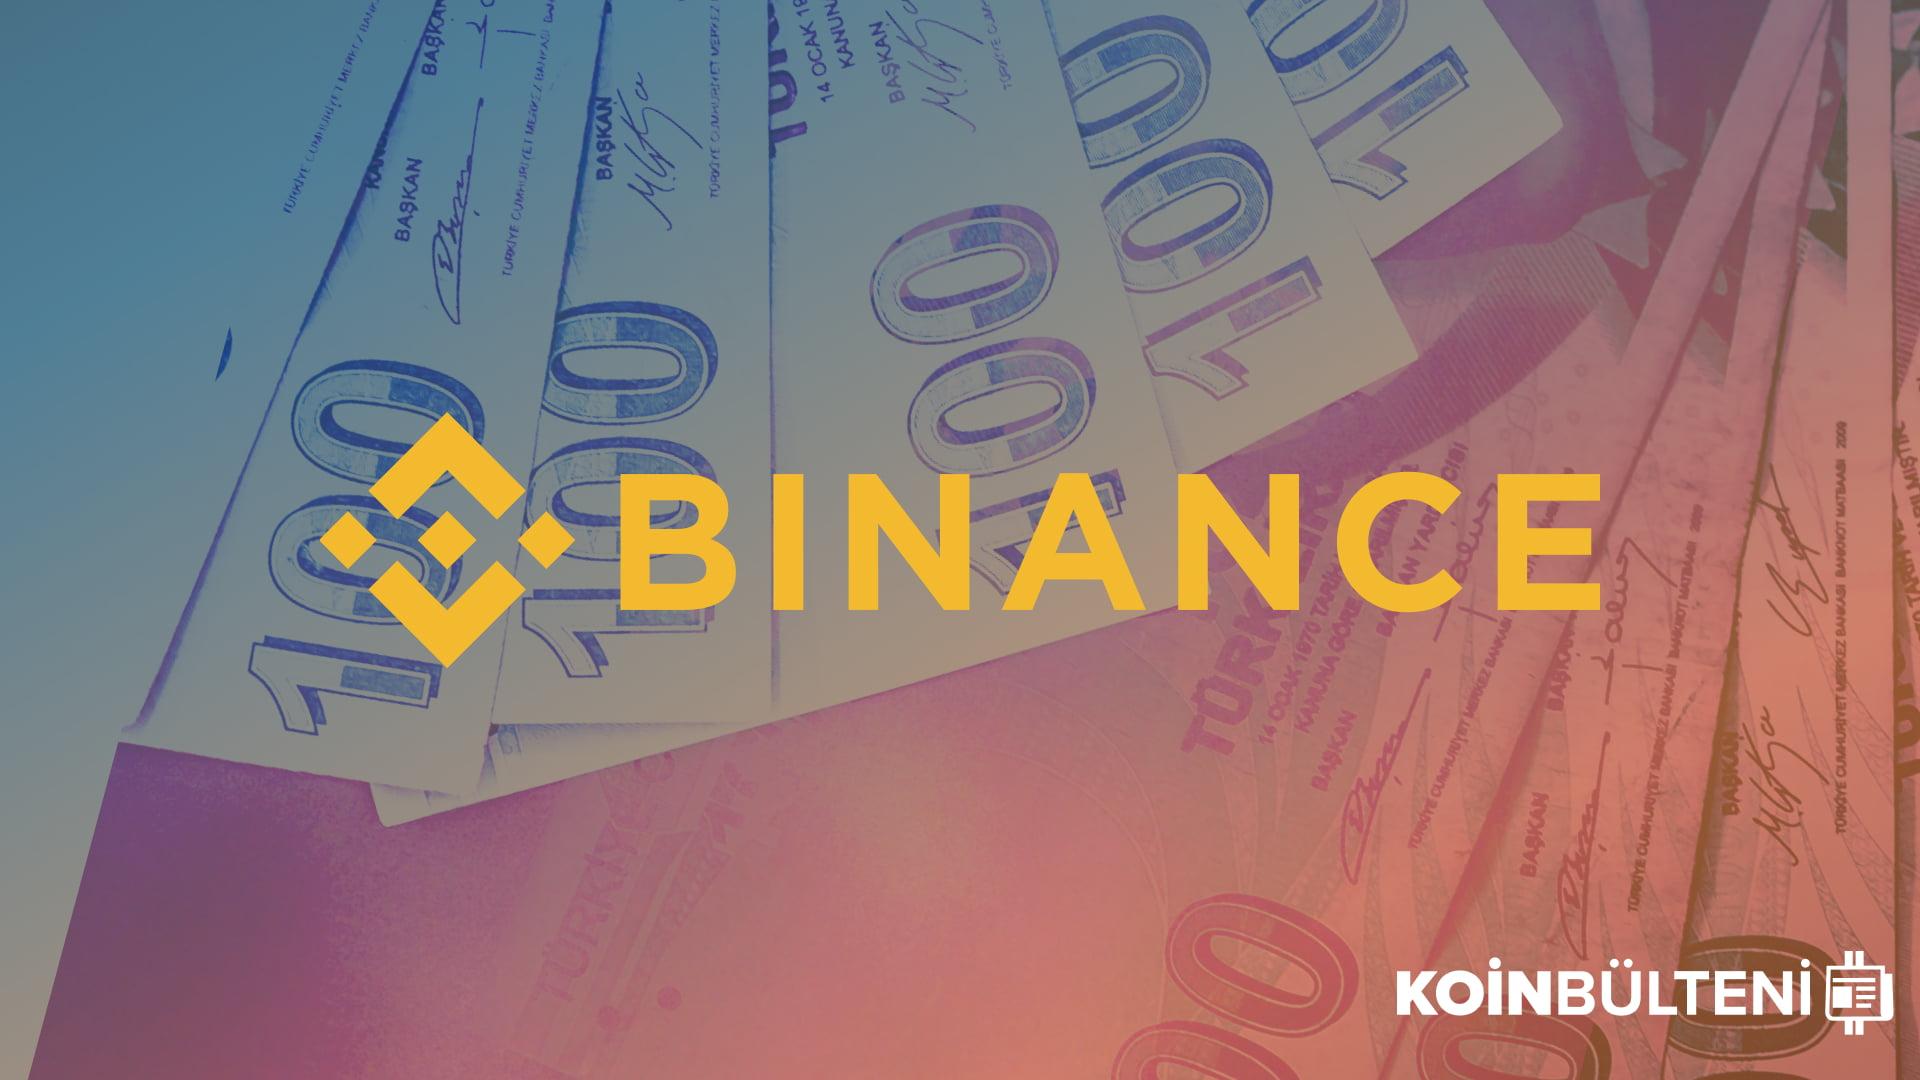 bitcoin-borsa-binance-turk-lira-yatirim-alim-satim-chiliz-stellar-xlm